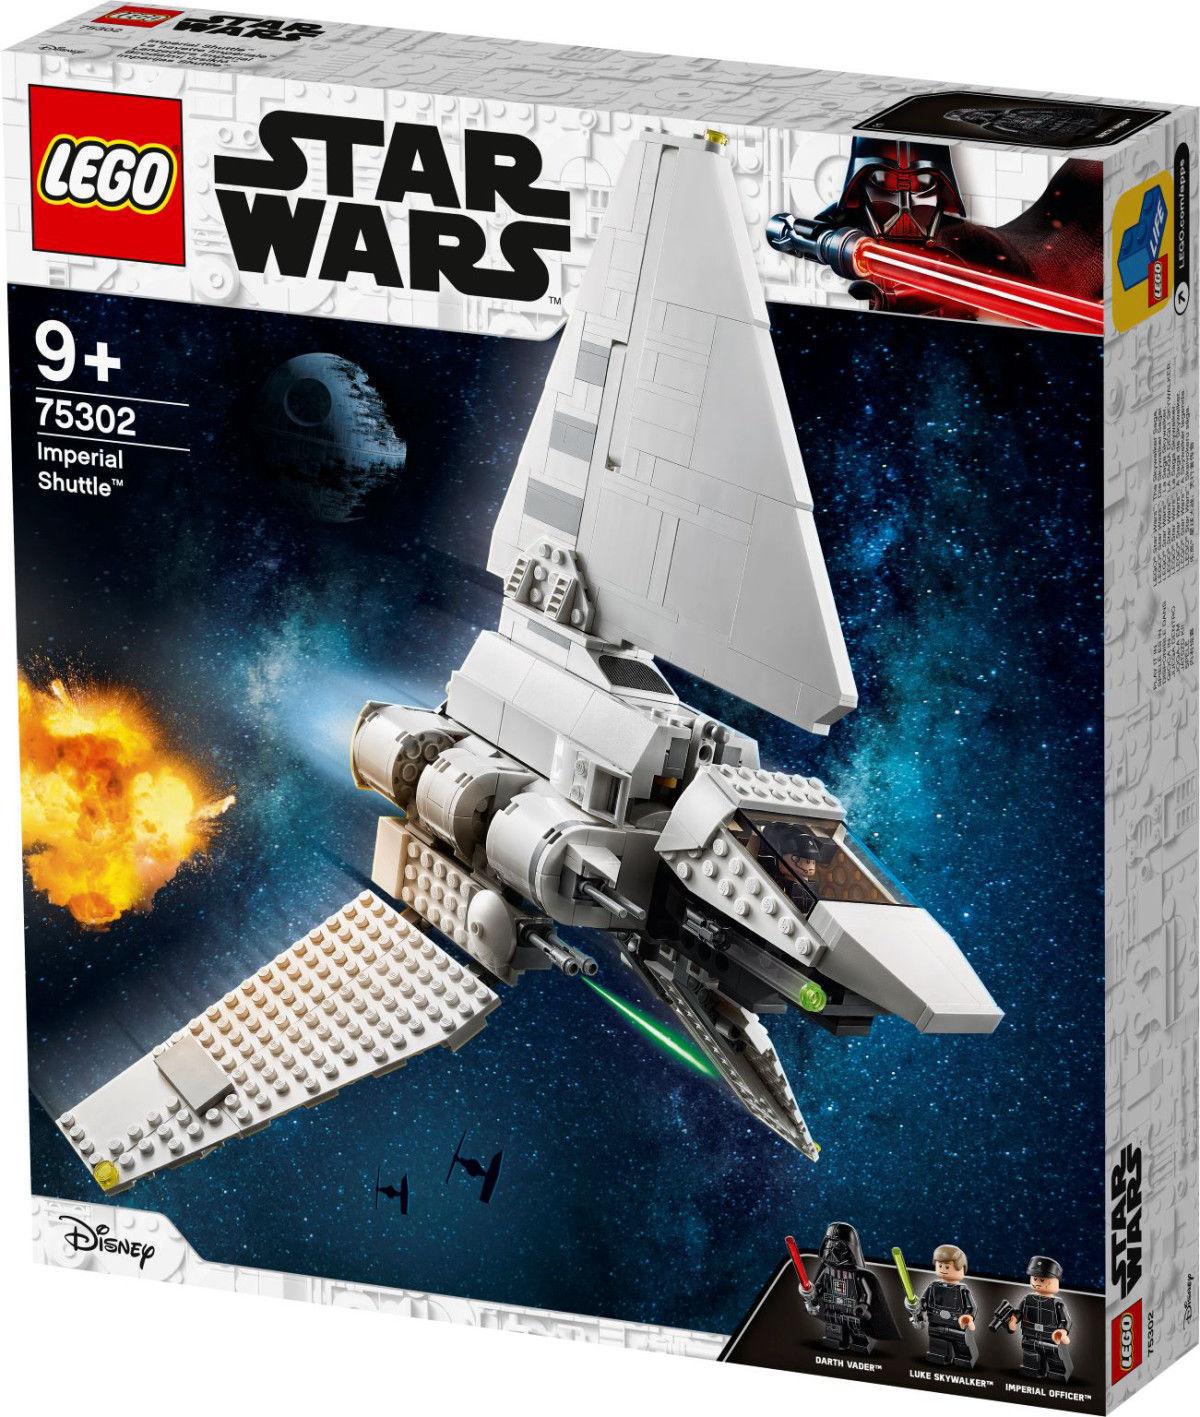 Lego Imperial Shuttle™ 75302